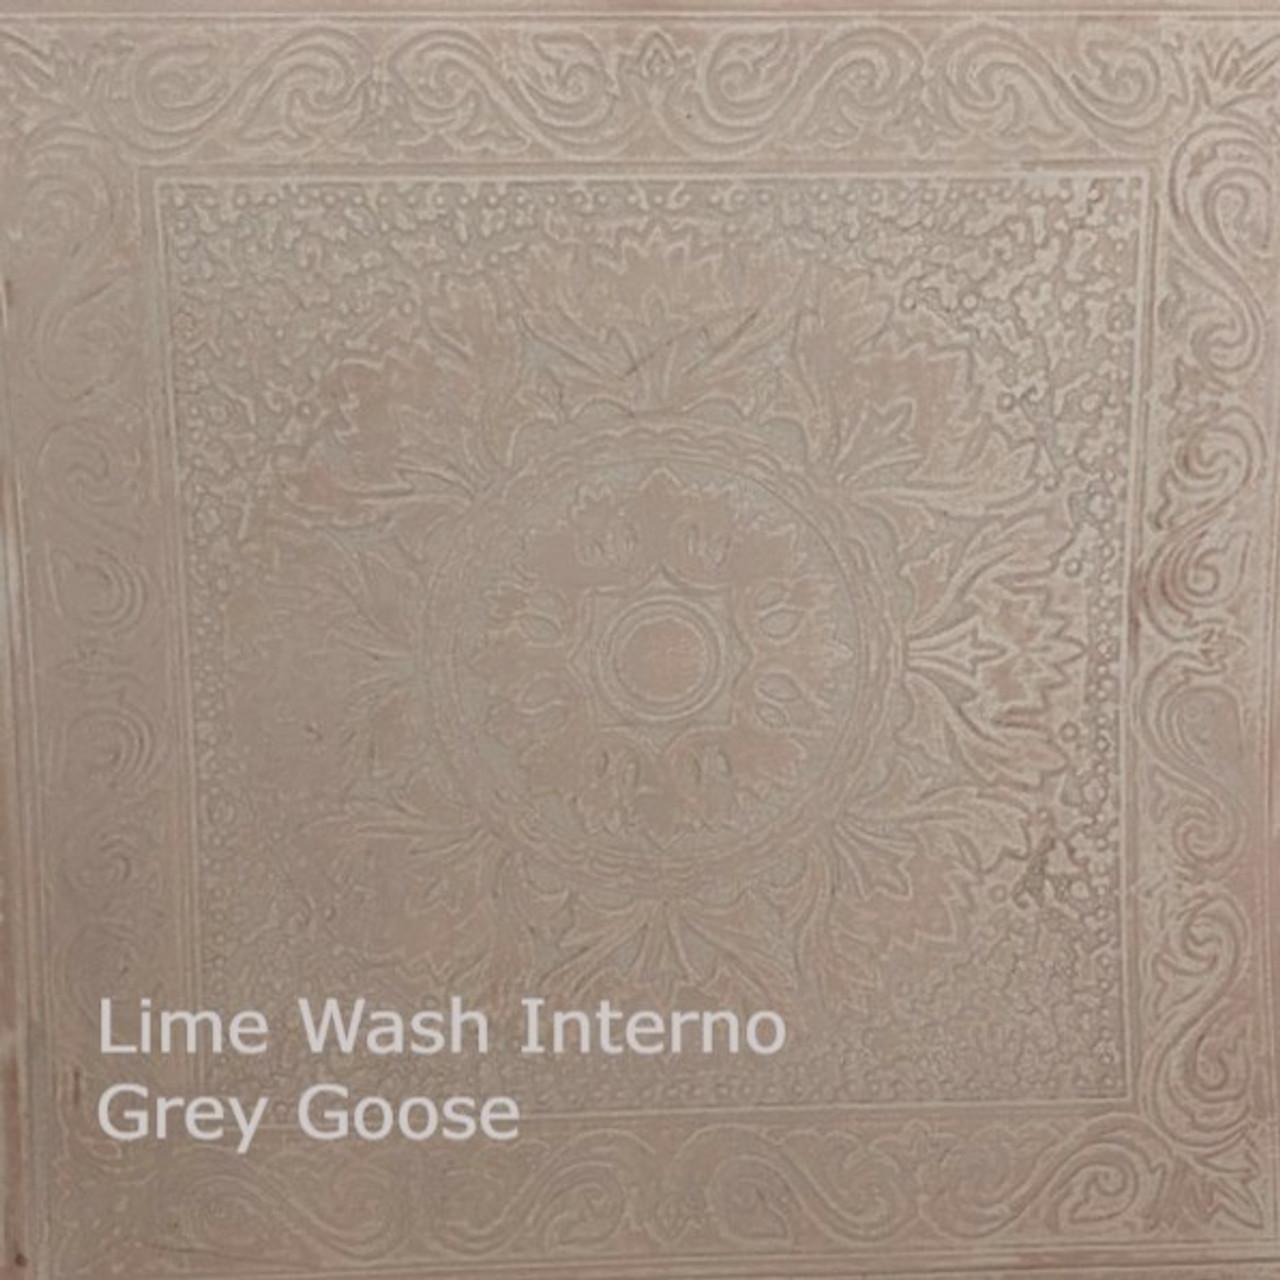 Interno Lime Wash, Grey Goose